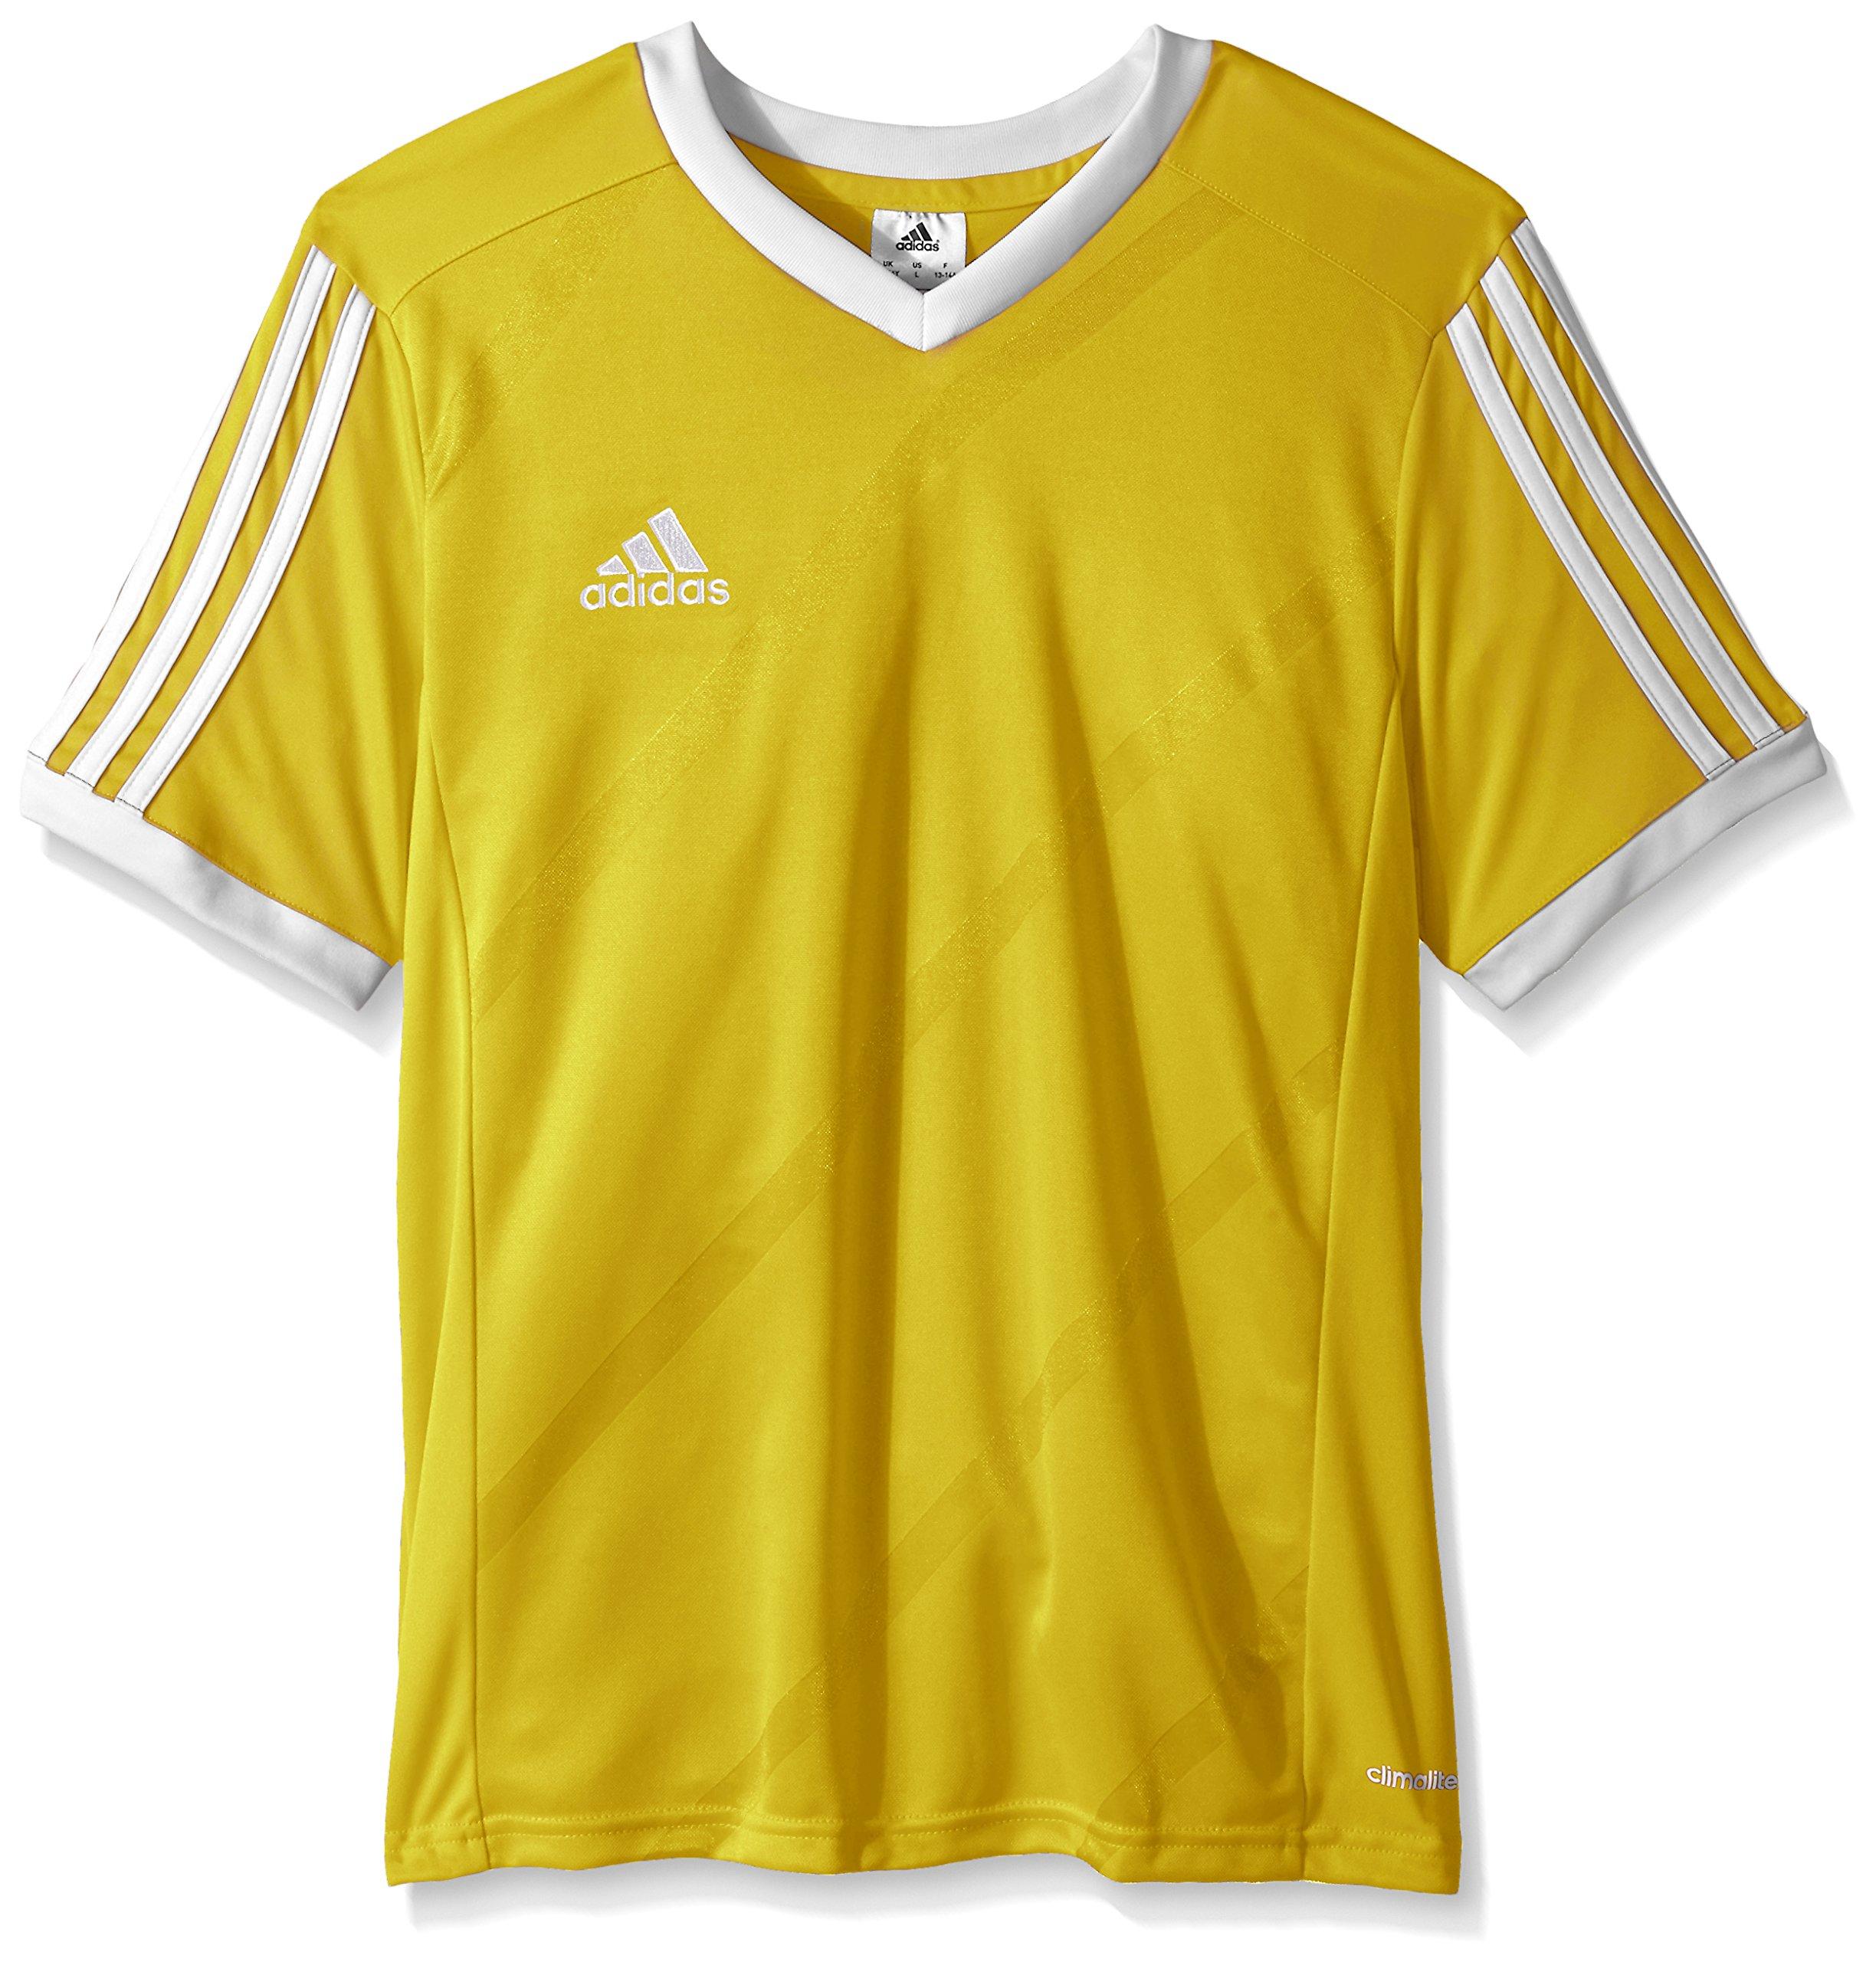 Galleon - Adidas Performance Boys Youth Tabela 14 Short Sleeve Jersey e4323c94e